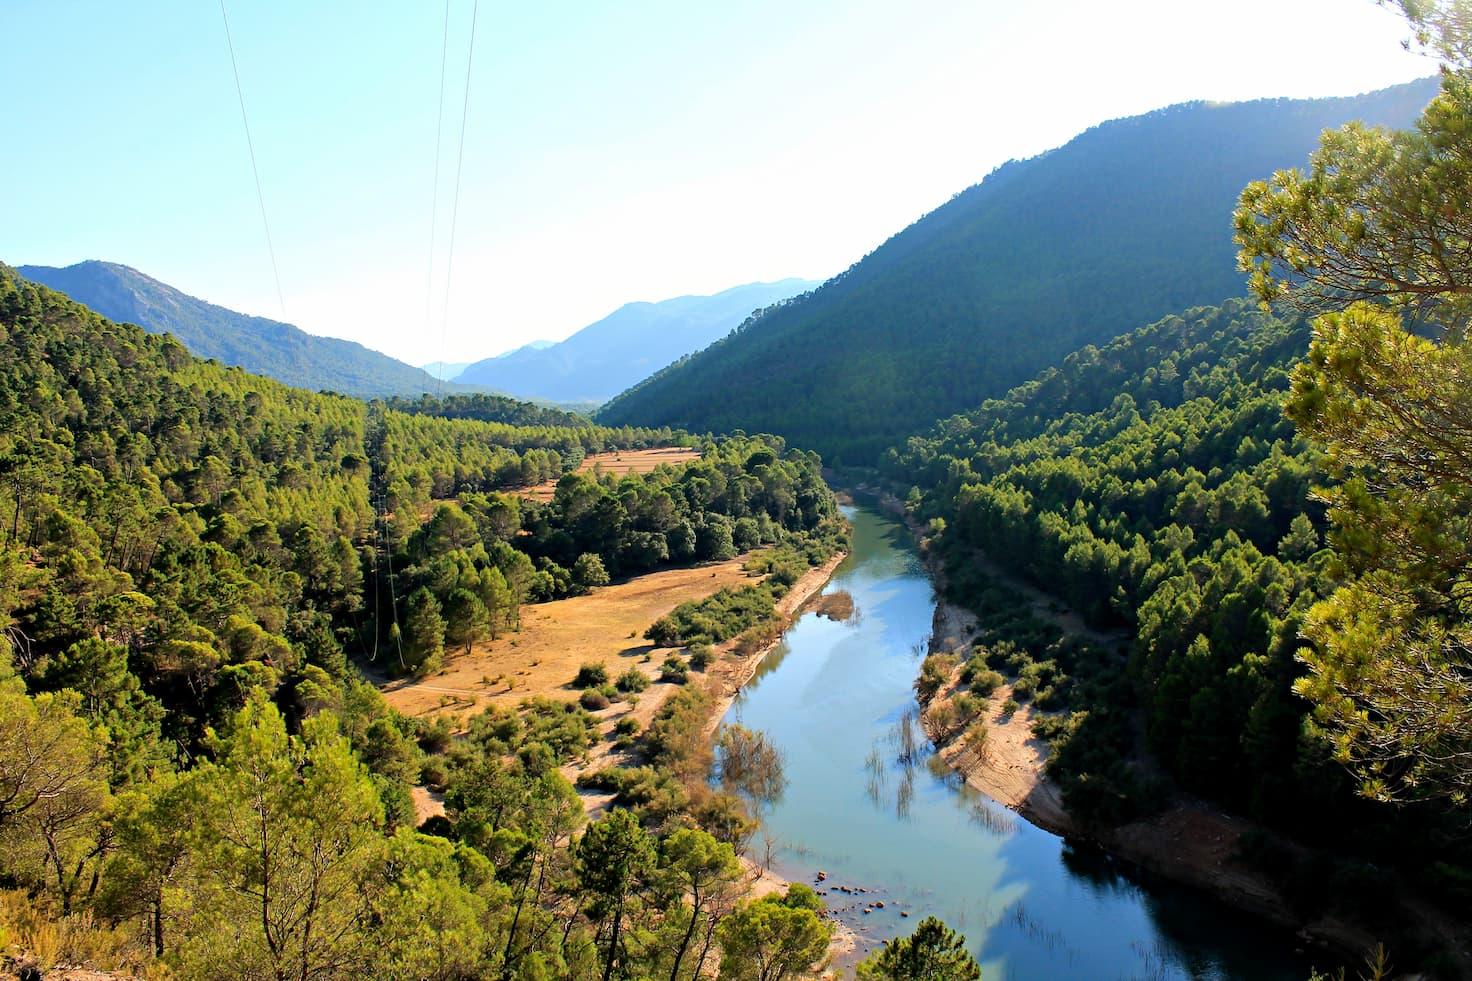 mejores parques naturales de Andalucía